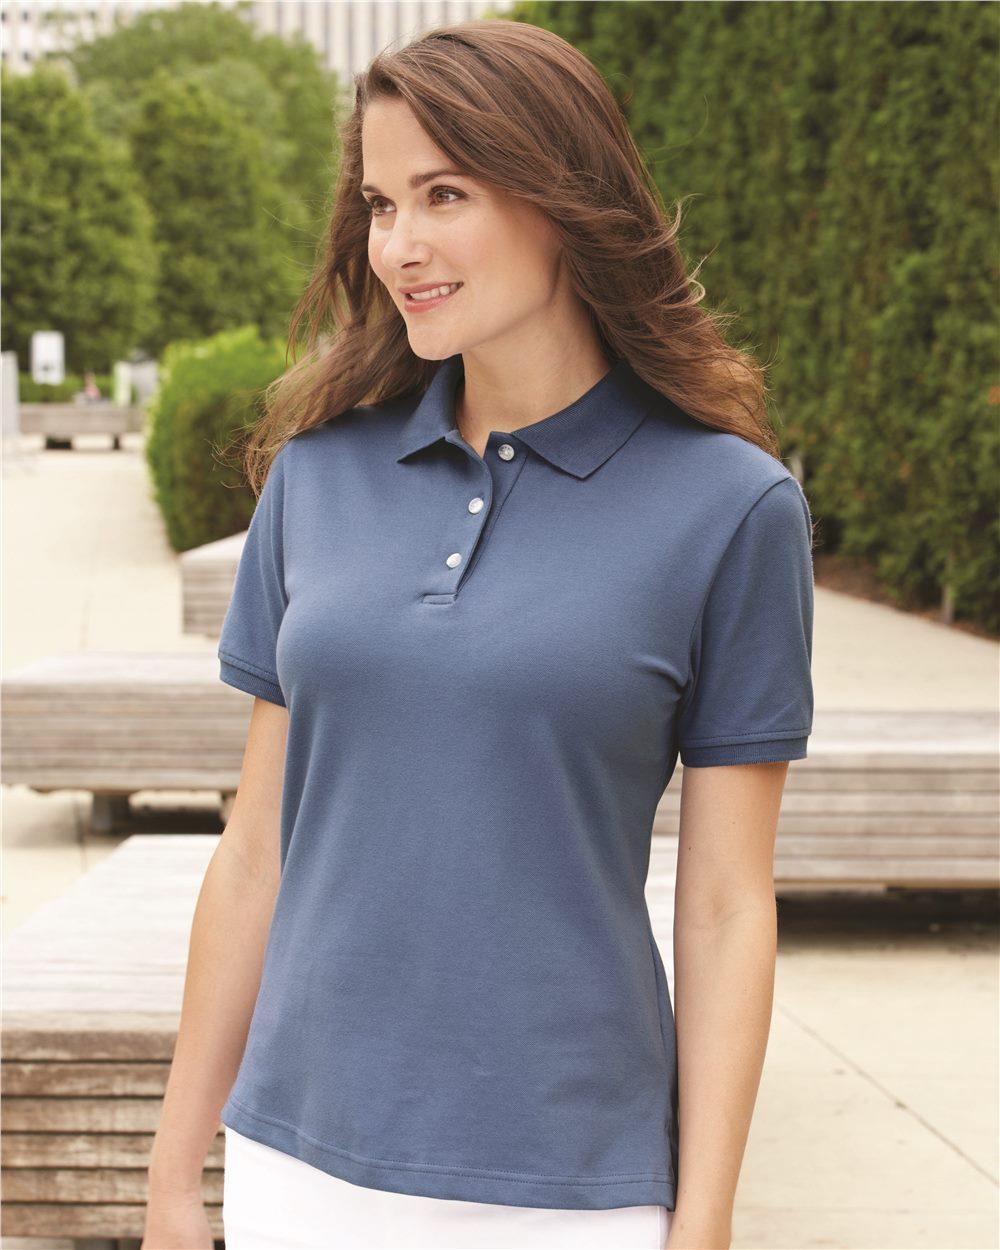 IZOD 13Z0063 - Ladies' Classic Silkwash Pique Sport Shirt